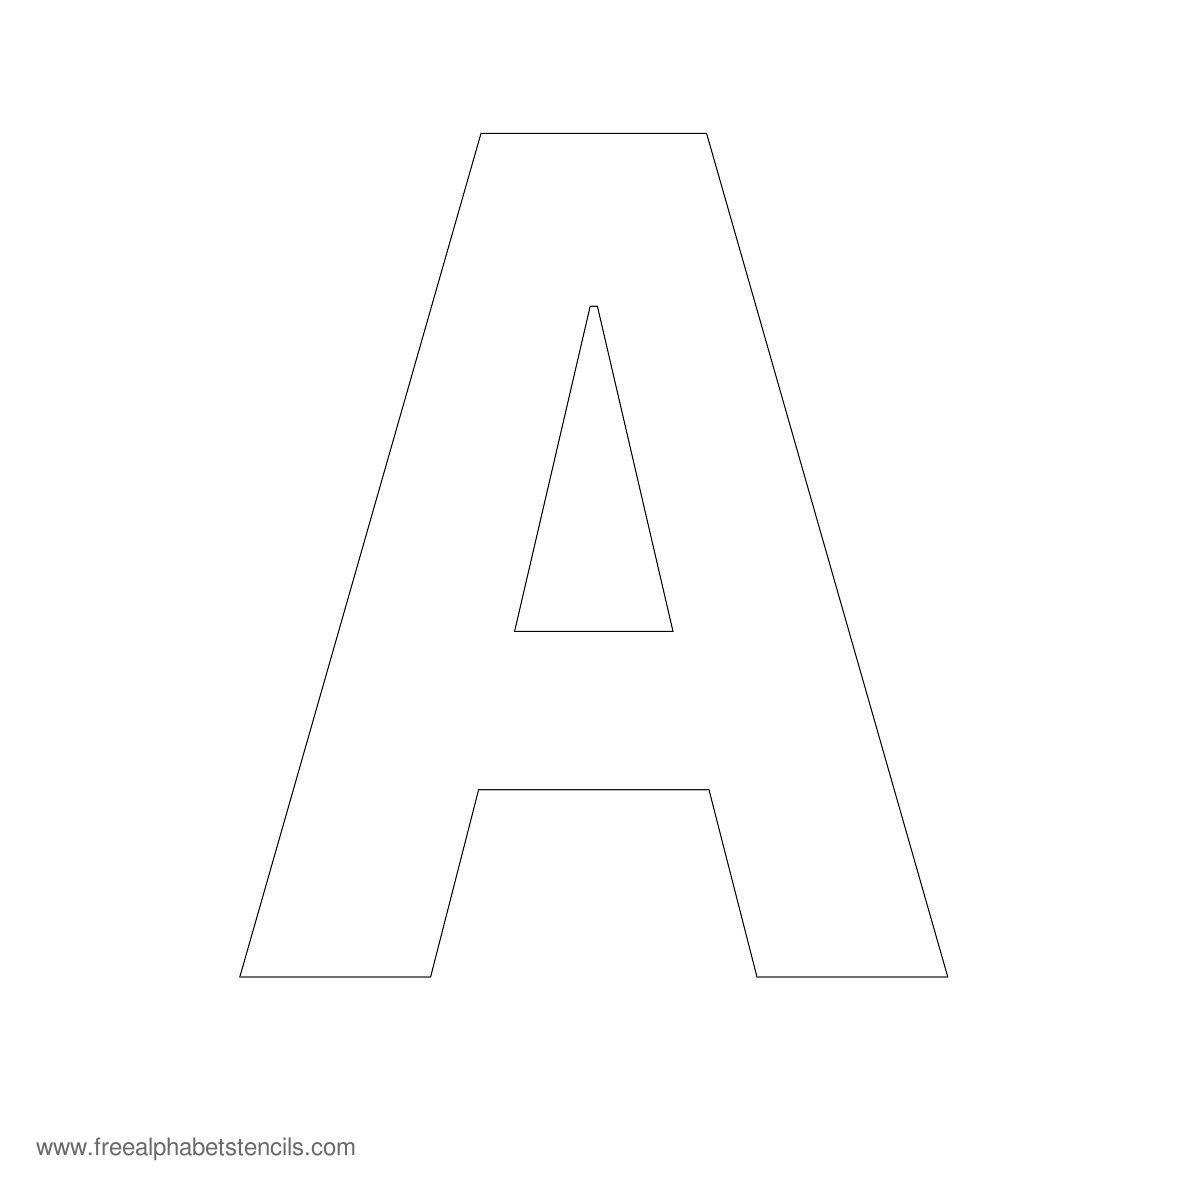 Large Alphabet Stencils | Freealphabetstencils - Free Printable 8 Inch Letters